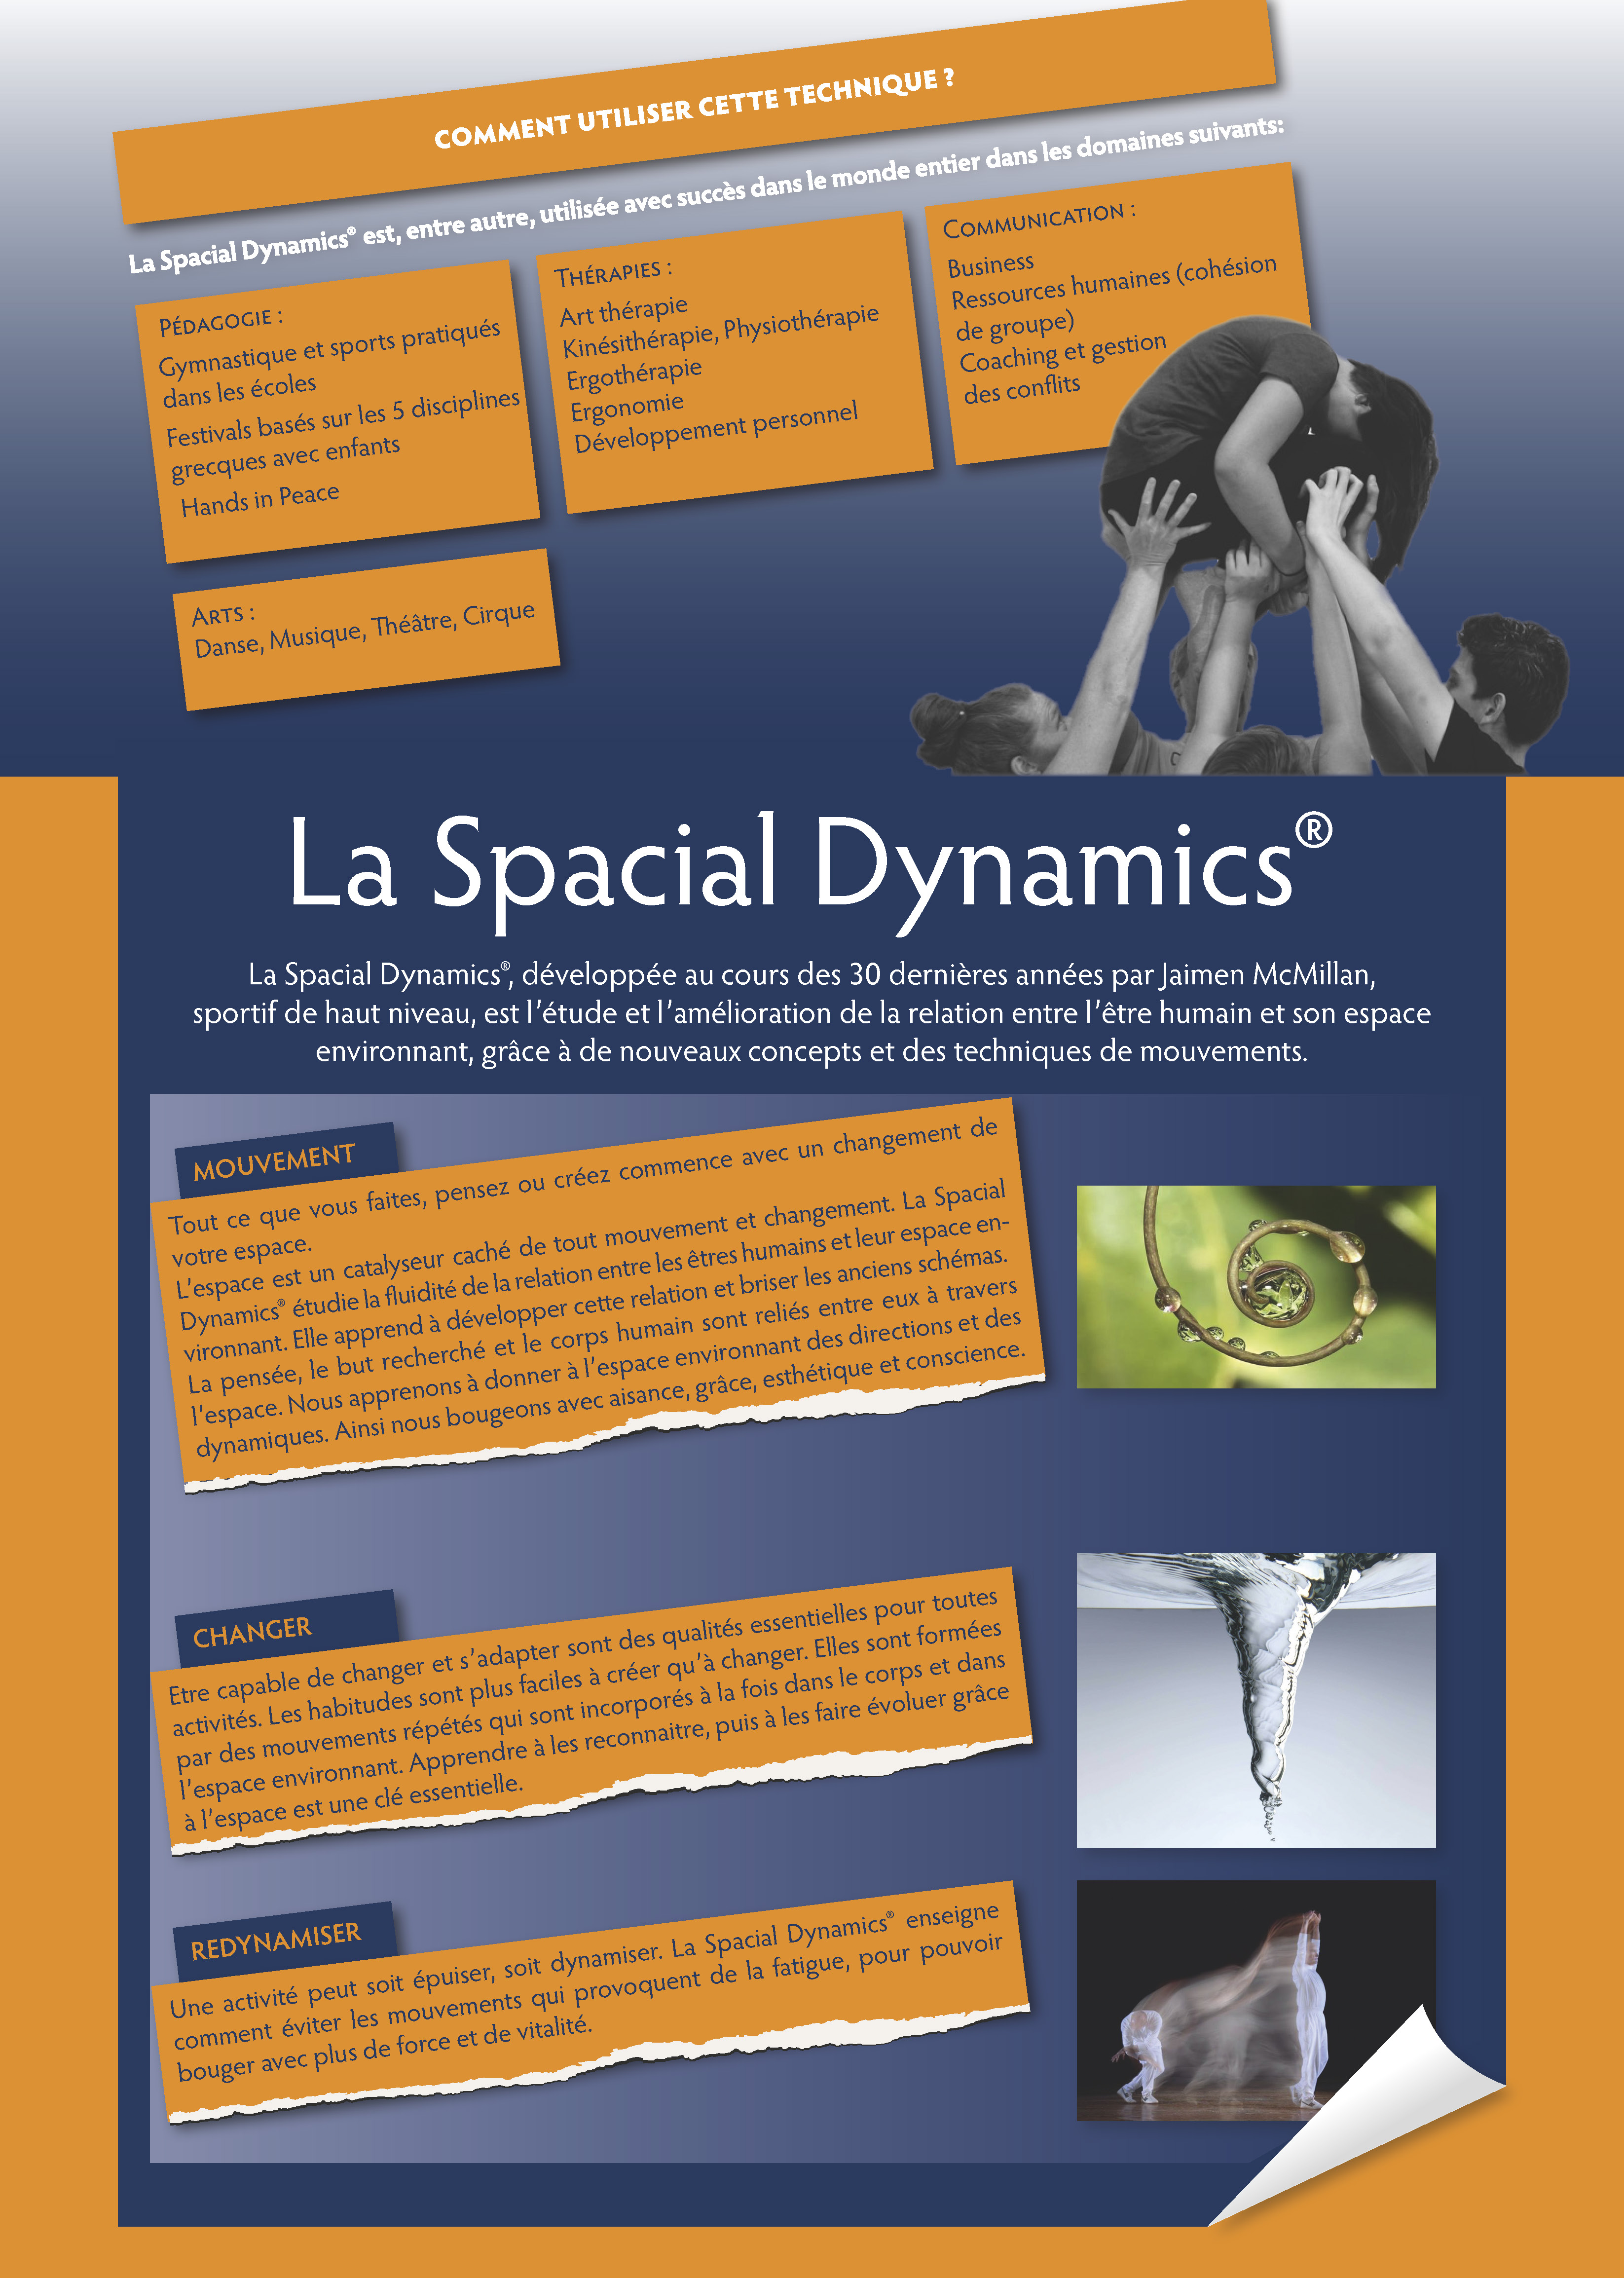 Spacial Dynamics